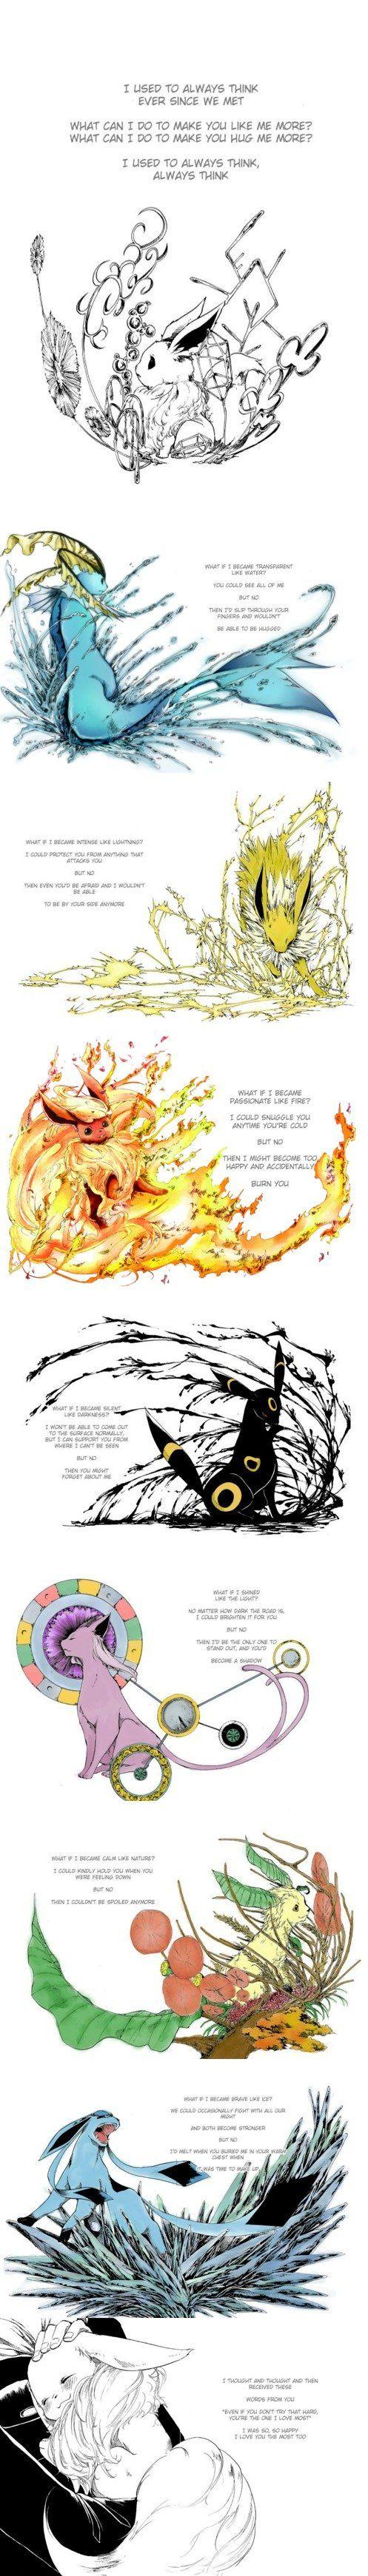 best images about pokemon on pinterest pokemon stuff drawings